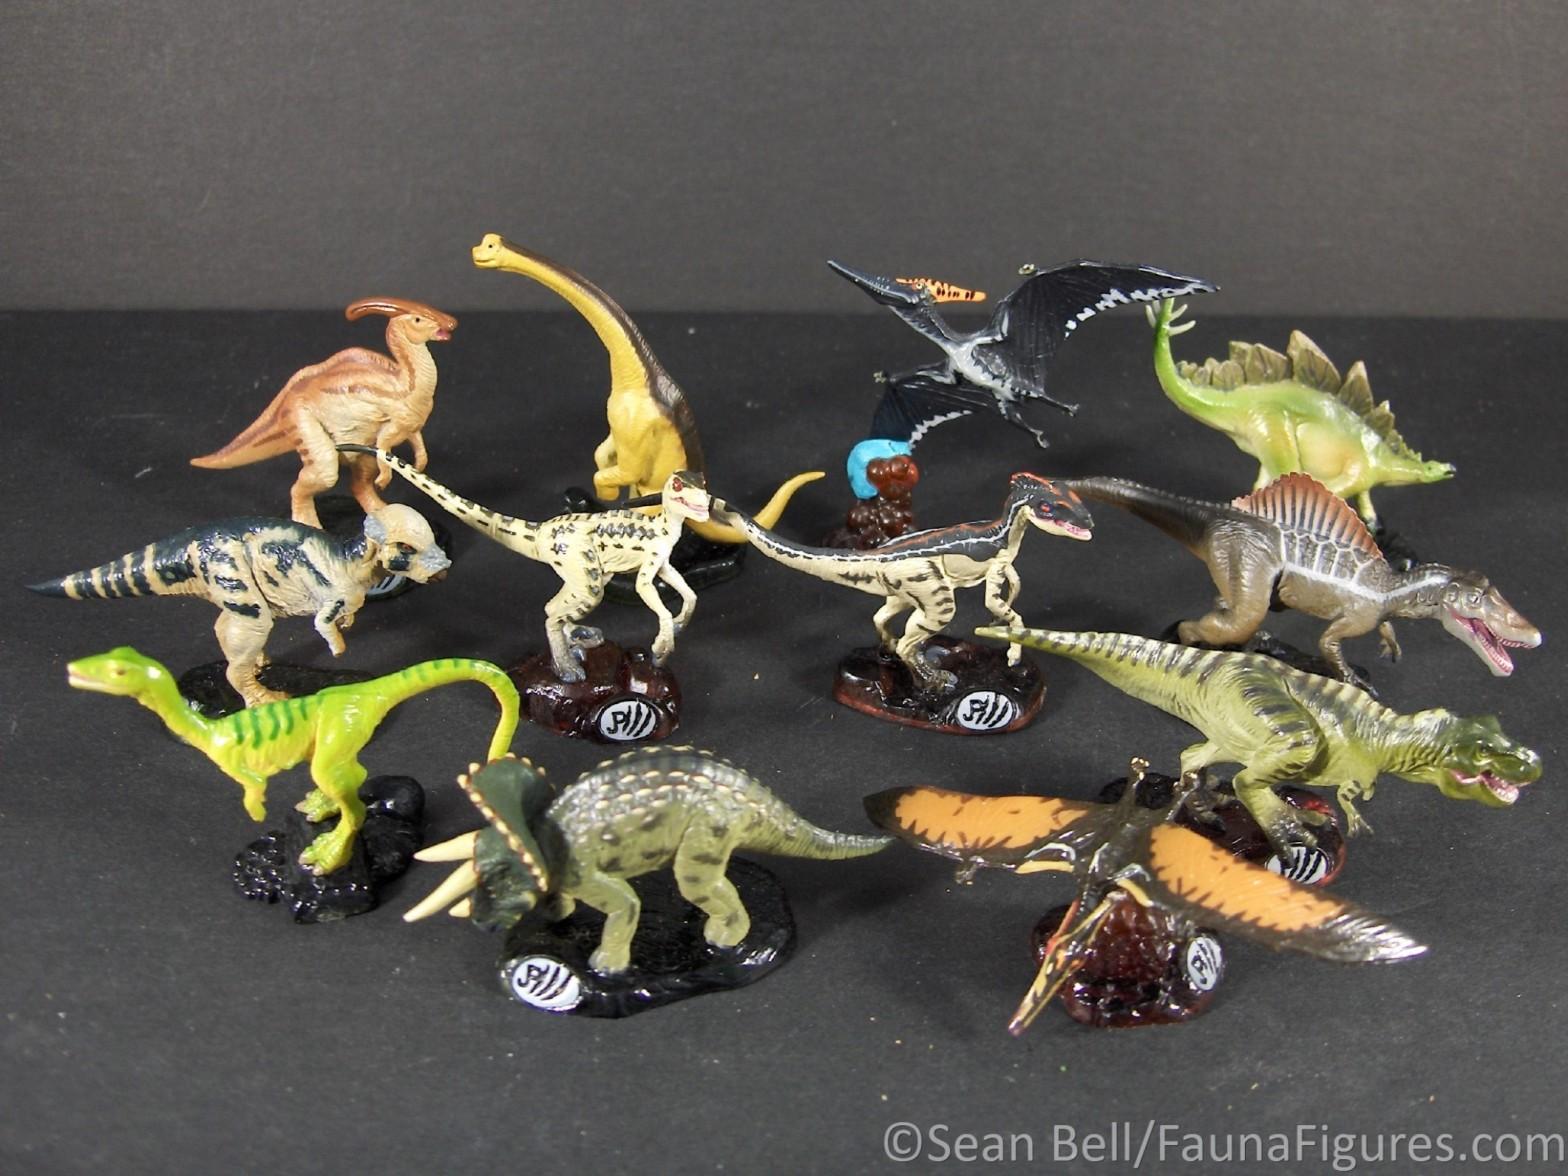 Kaiyodo Japan Exclusive Jurassic Park Brachiosaurus PVC Dinosaur Figure